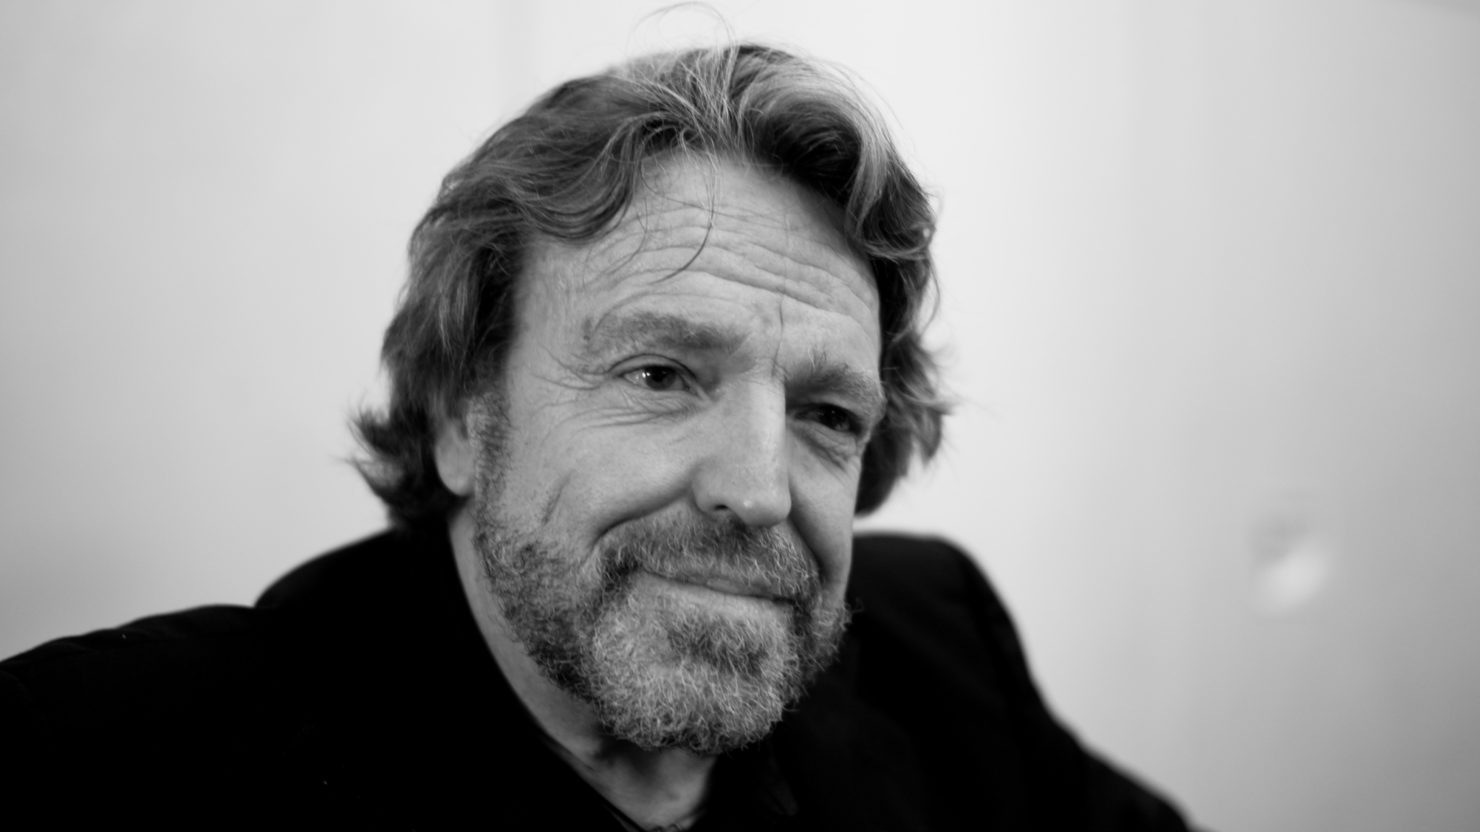 Grateful Dead Lyricist & Political Activist John Perry Barlow 1947 - 2018